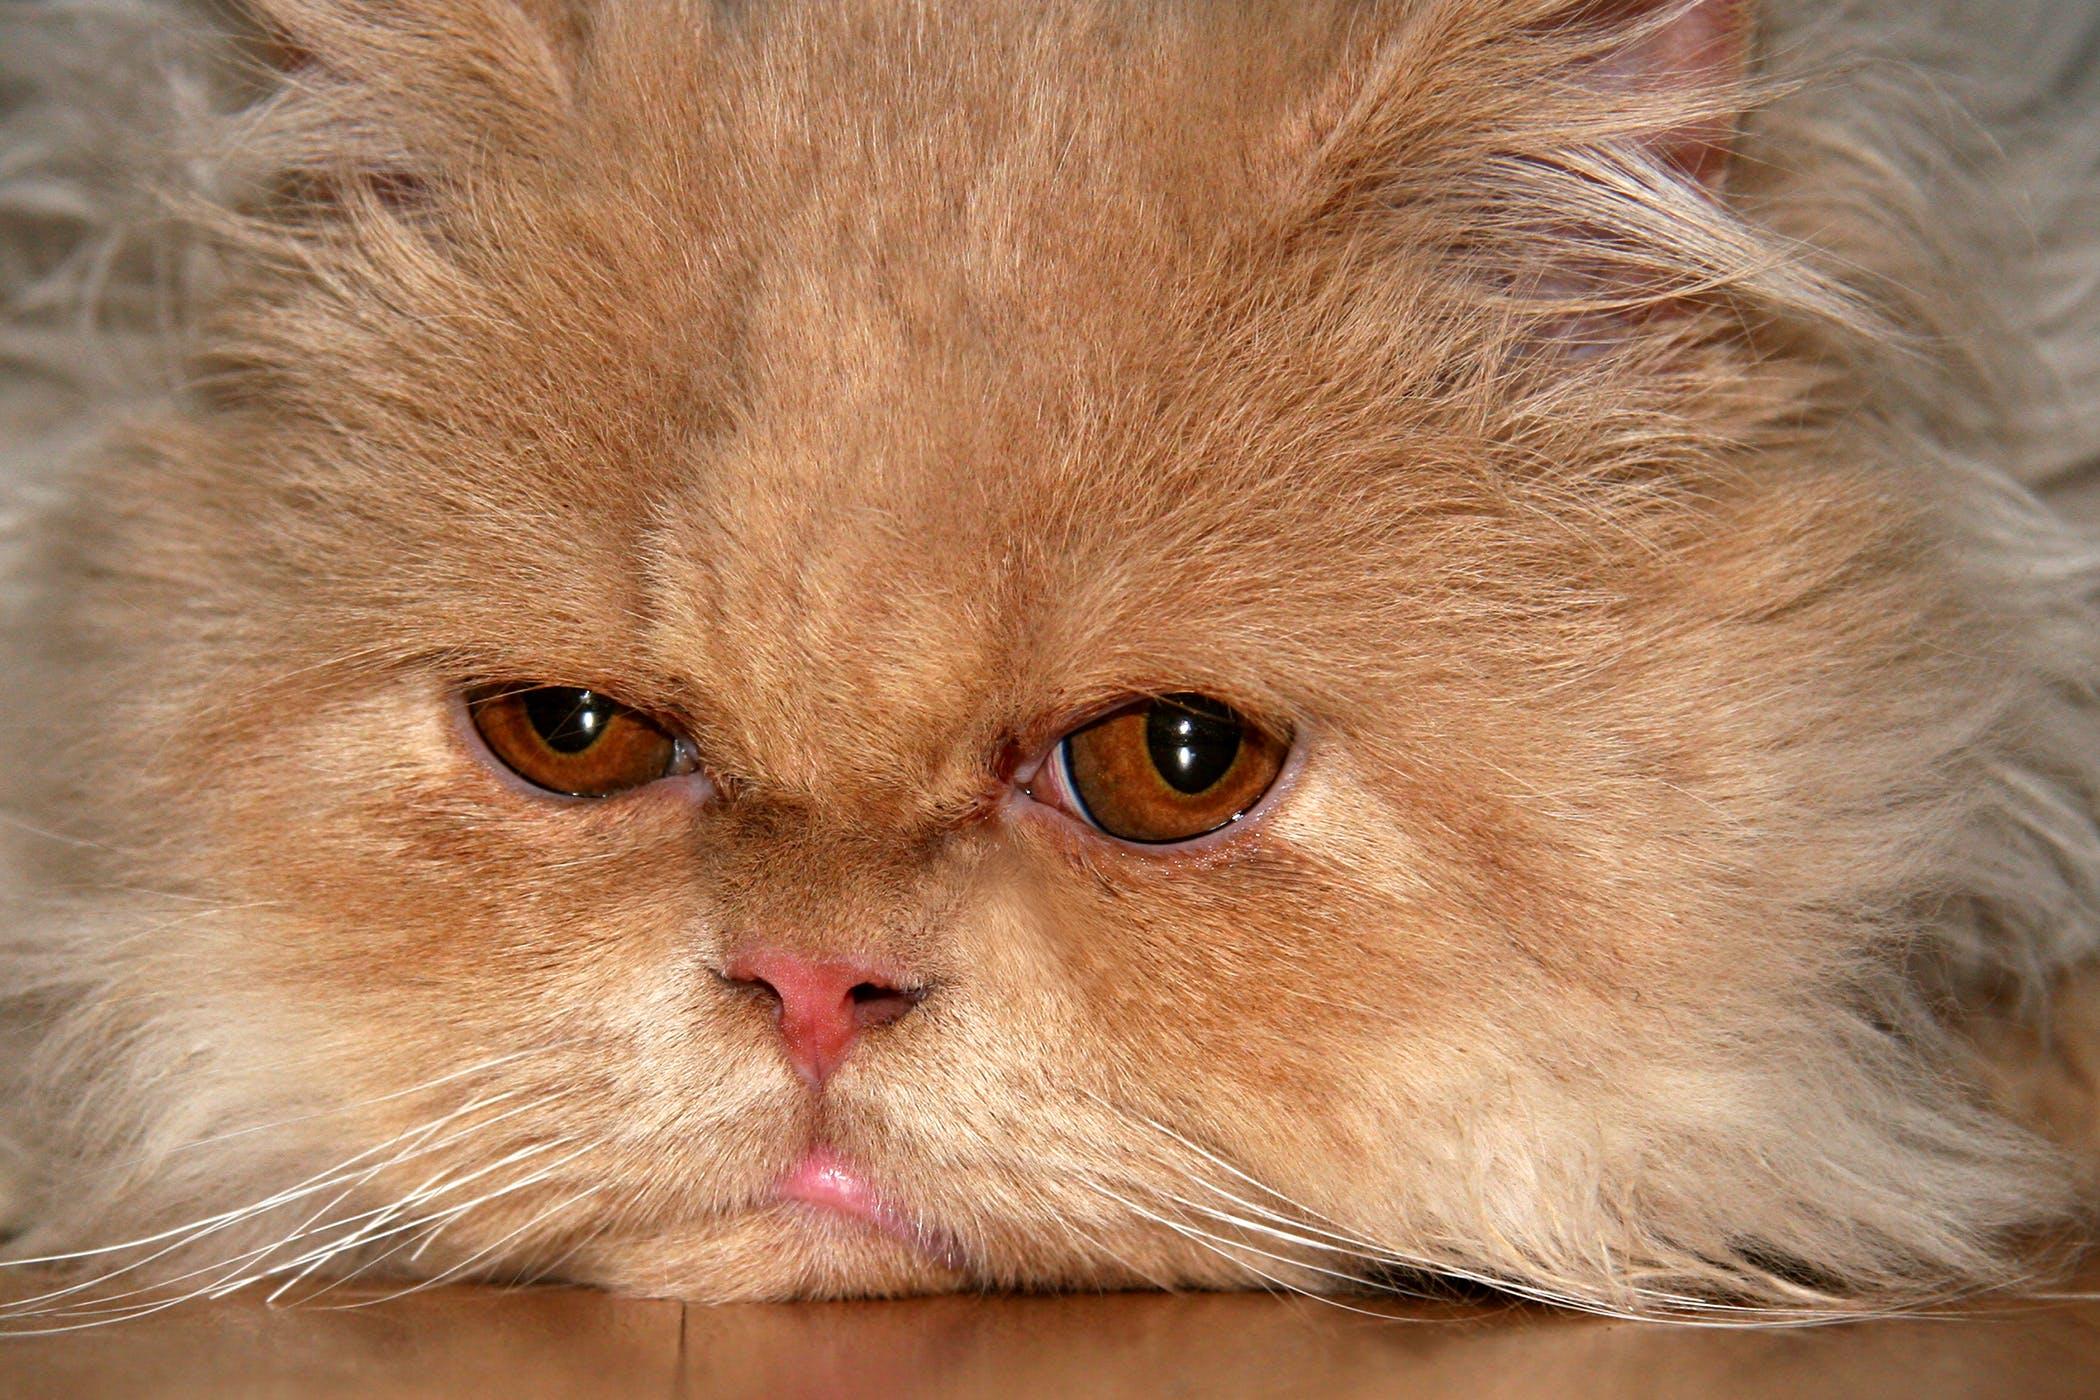 Immune-Mediated Polyarthritis in Cats